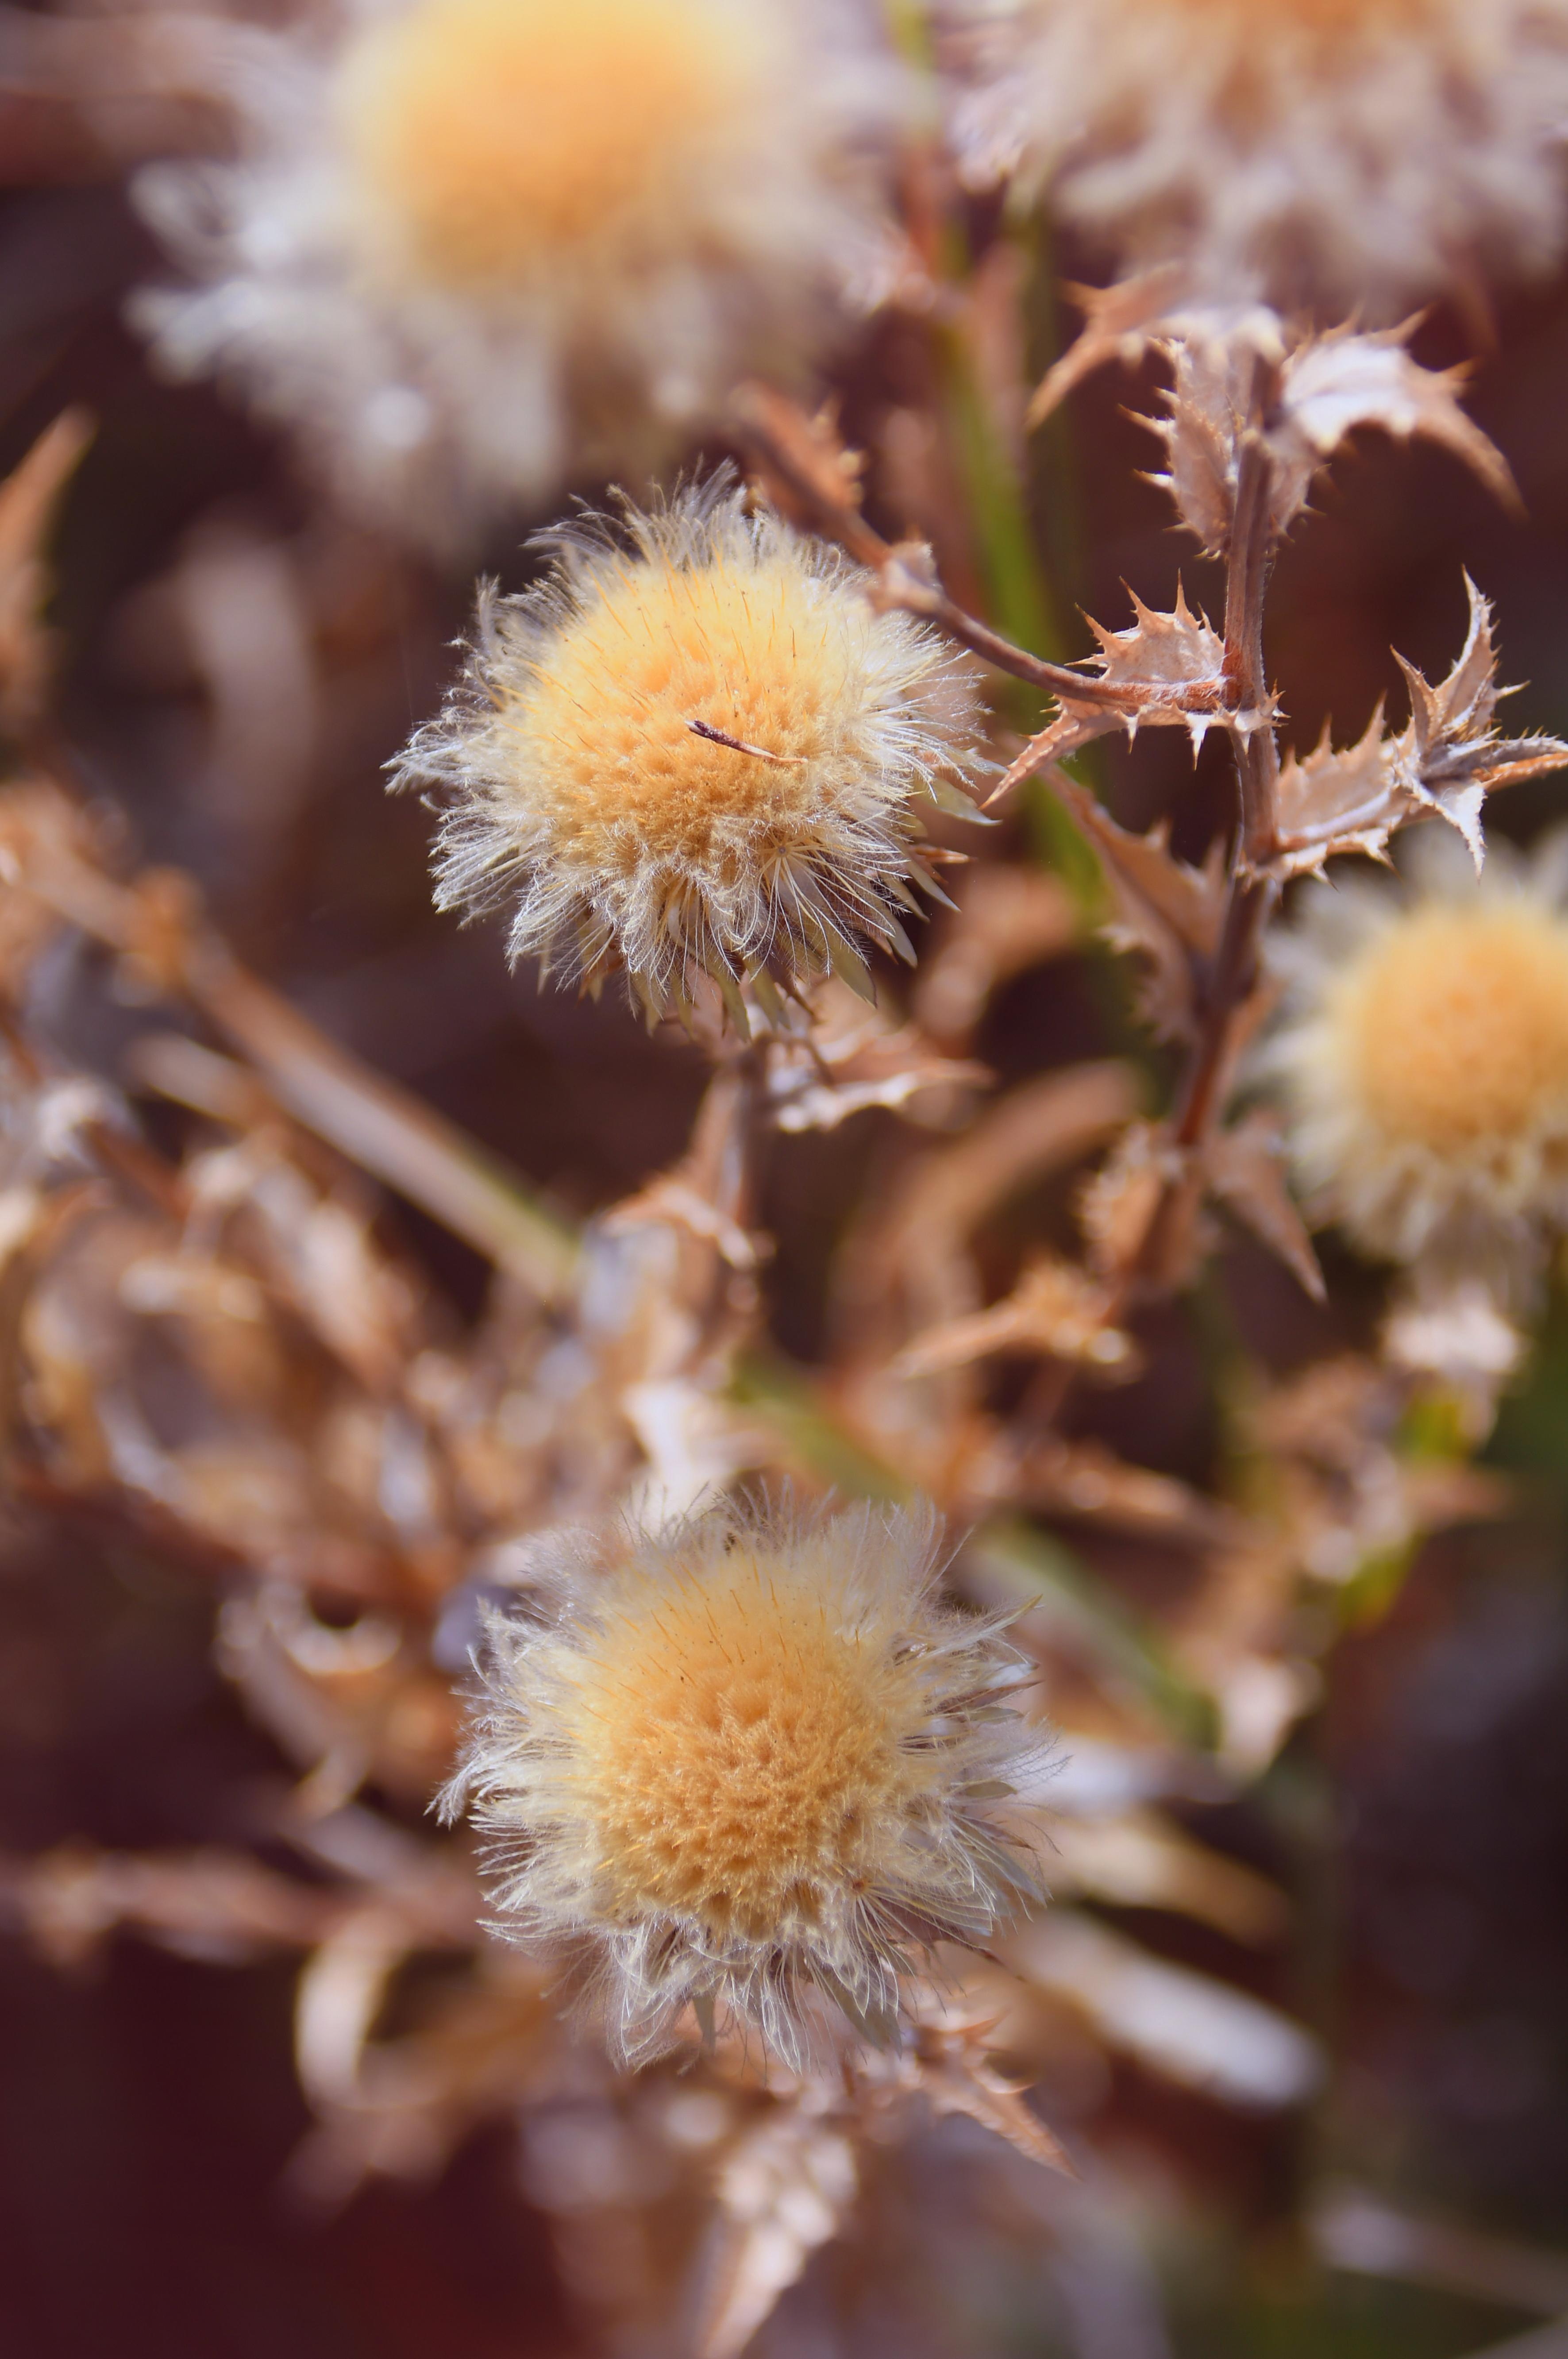 Gambar Bunga Bunga Kering Musim Gugur Terpencil Latar